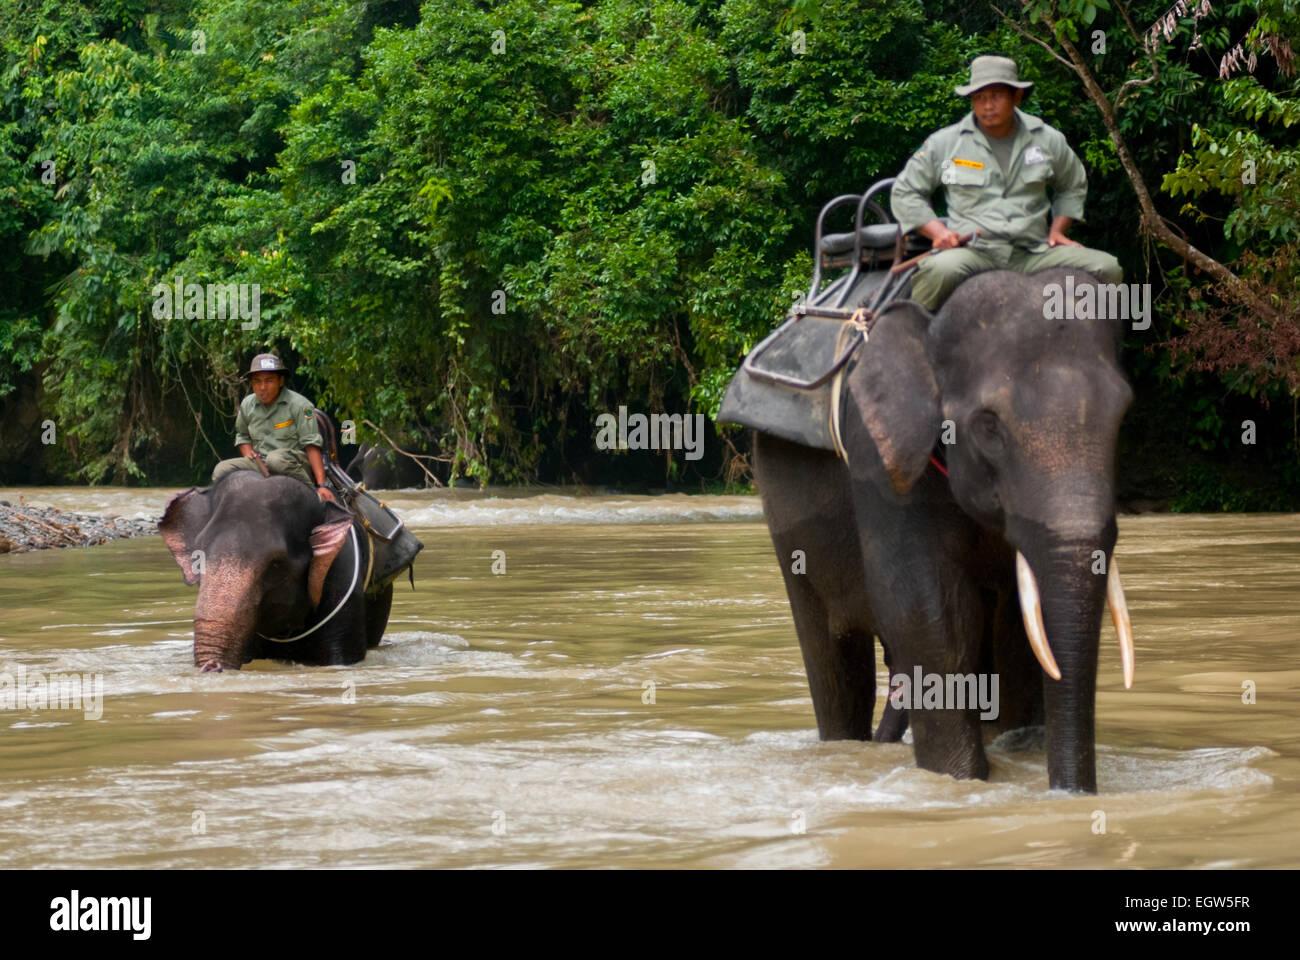 Elephant patrol in Gunung Leuser National Park, Sumatra. Stock Photo